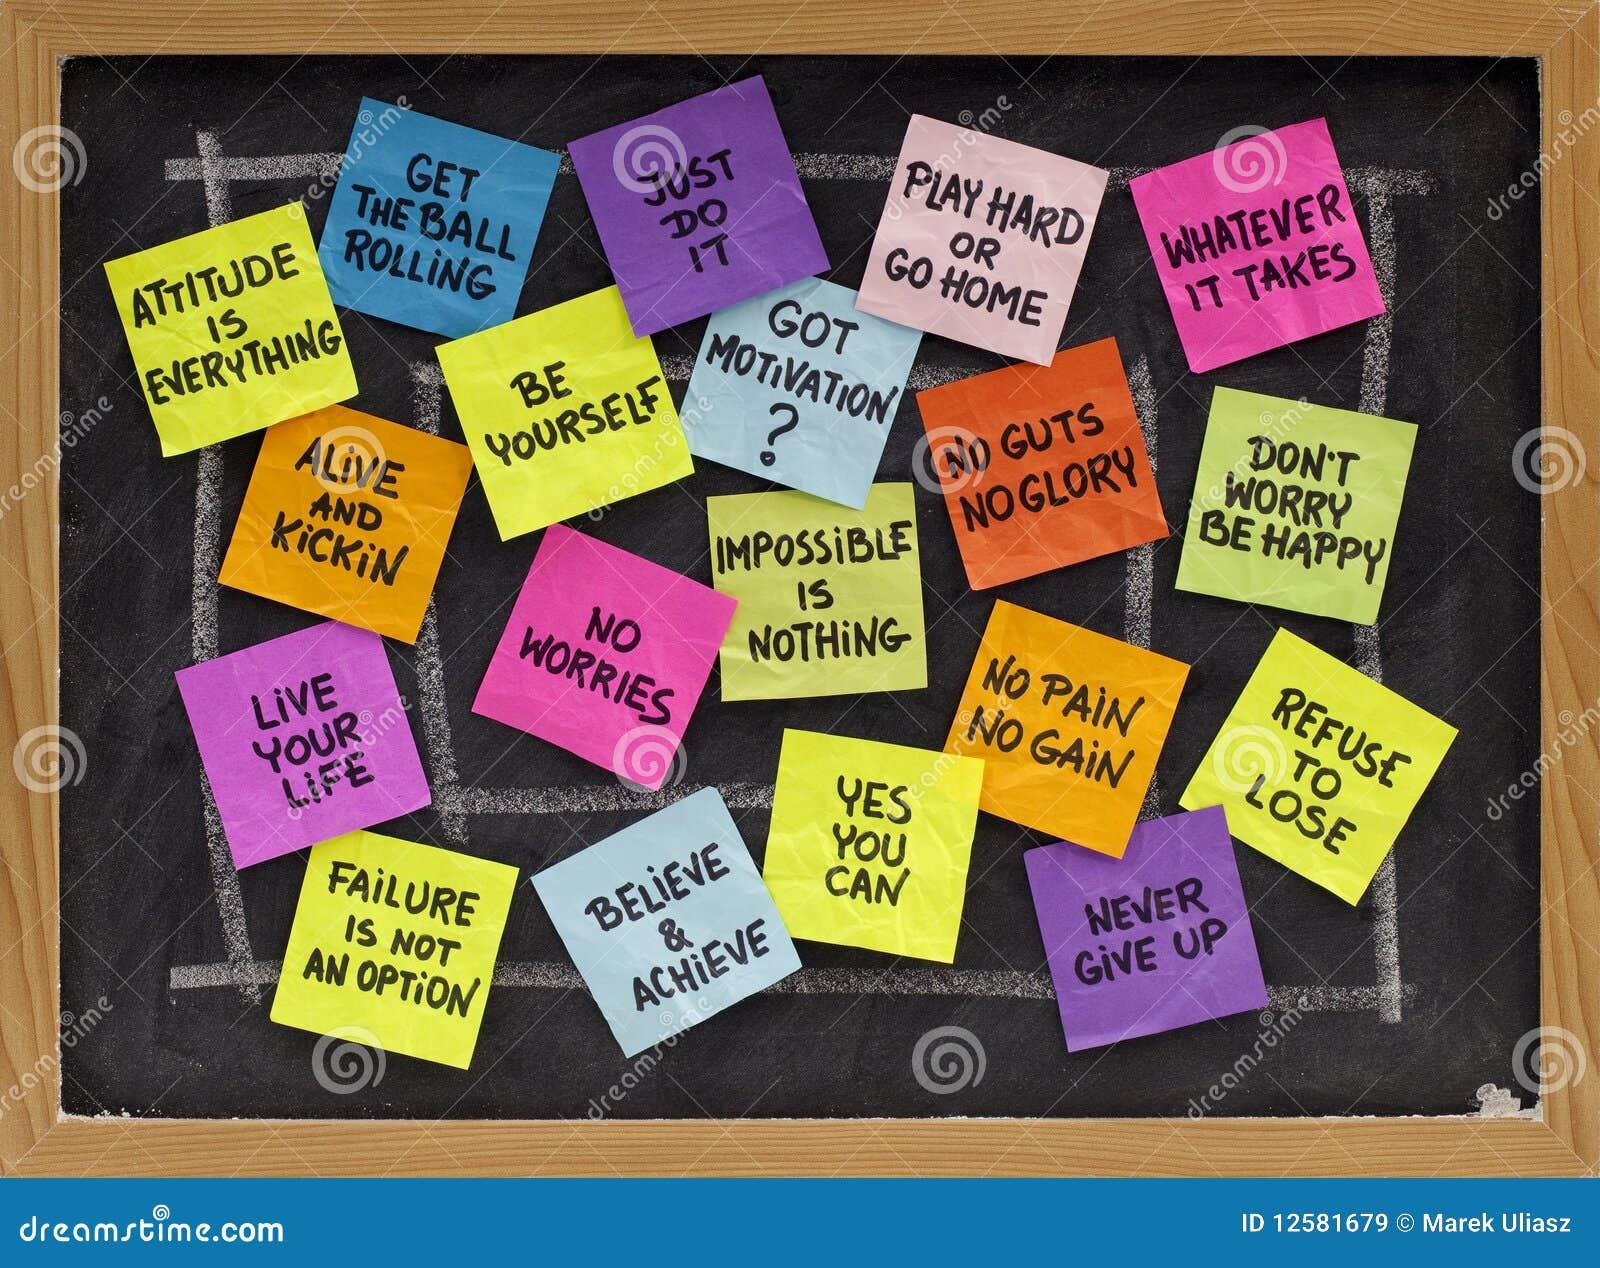 Motivational Slogans Motivational Slogans And Phrases Stock Image  Image 12581679